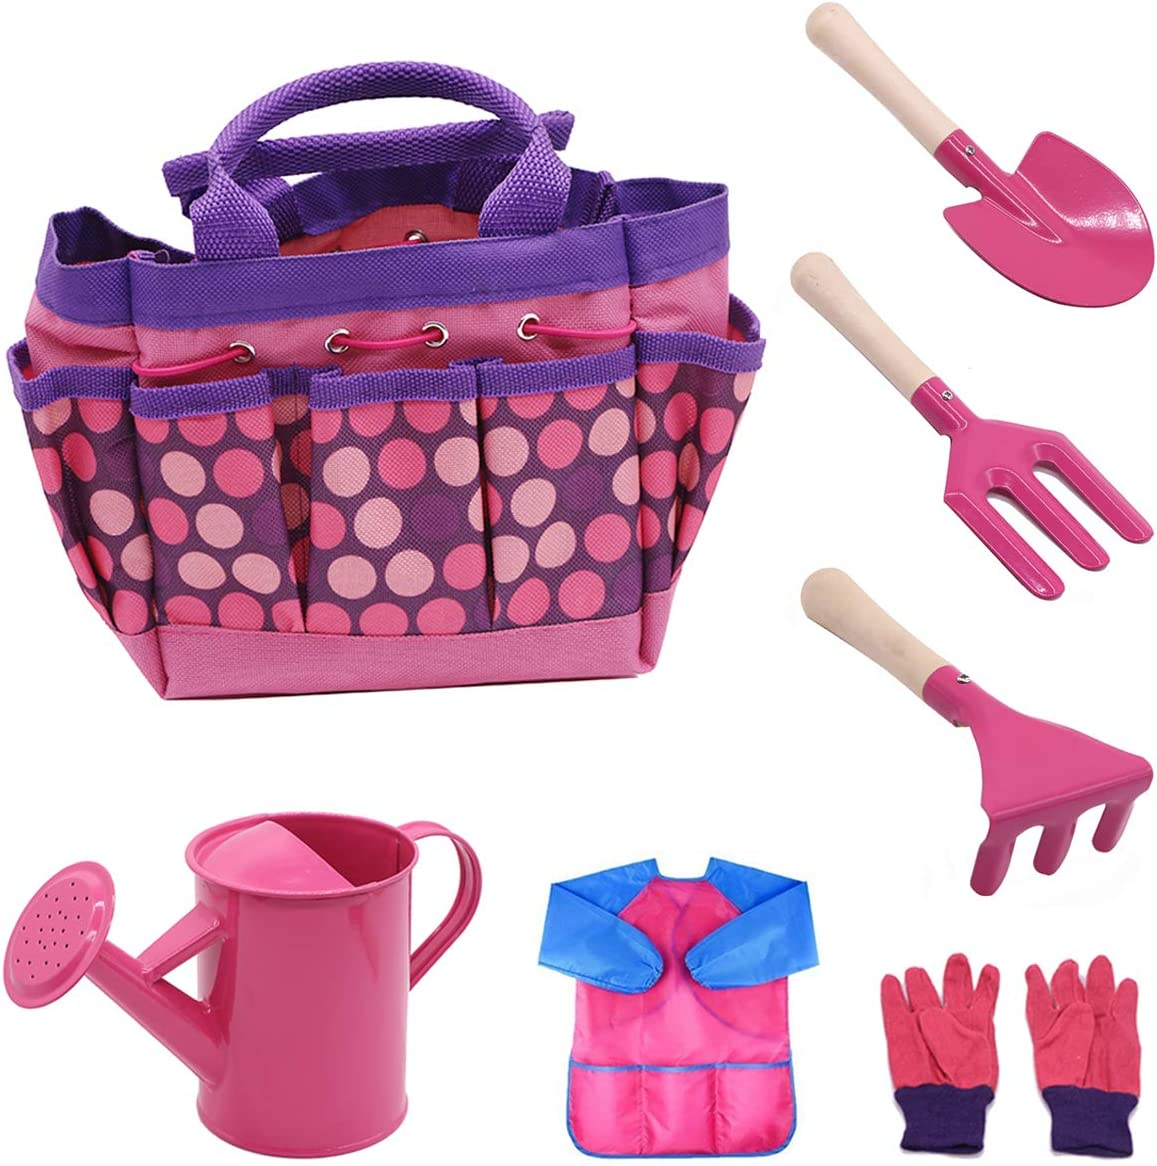 MoTrent Children Gardening Tools Set, 7 PCS Kids Garden Tool Toys Including Watering Can, Gardening Gloves, Shovel, Rake, Trowel, Garden Toe Bag and Kids Smock - Pink